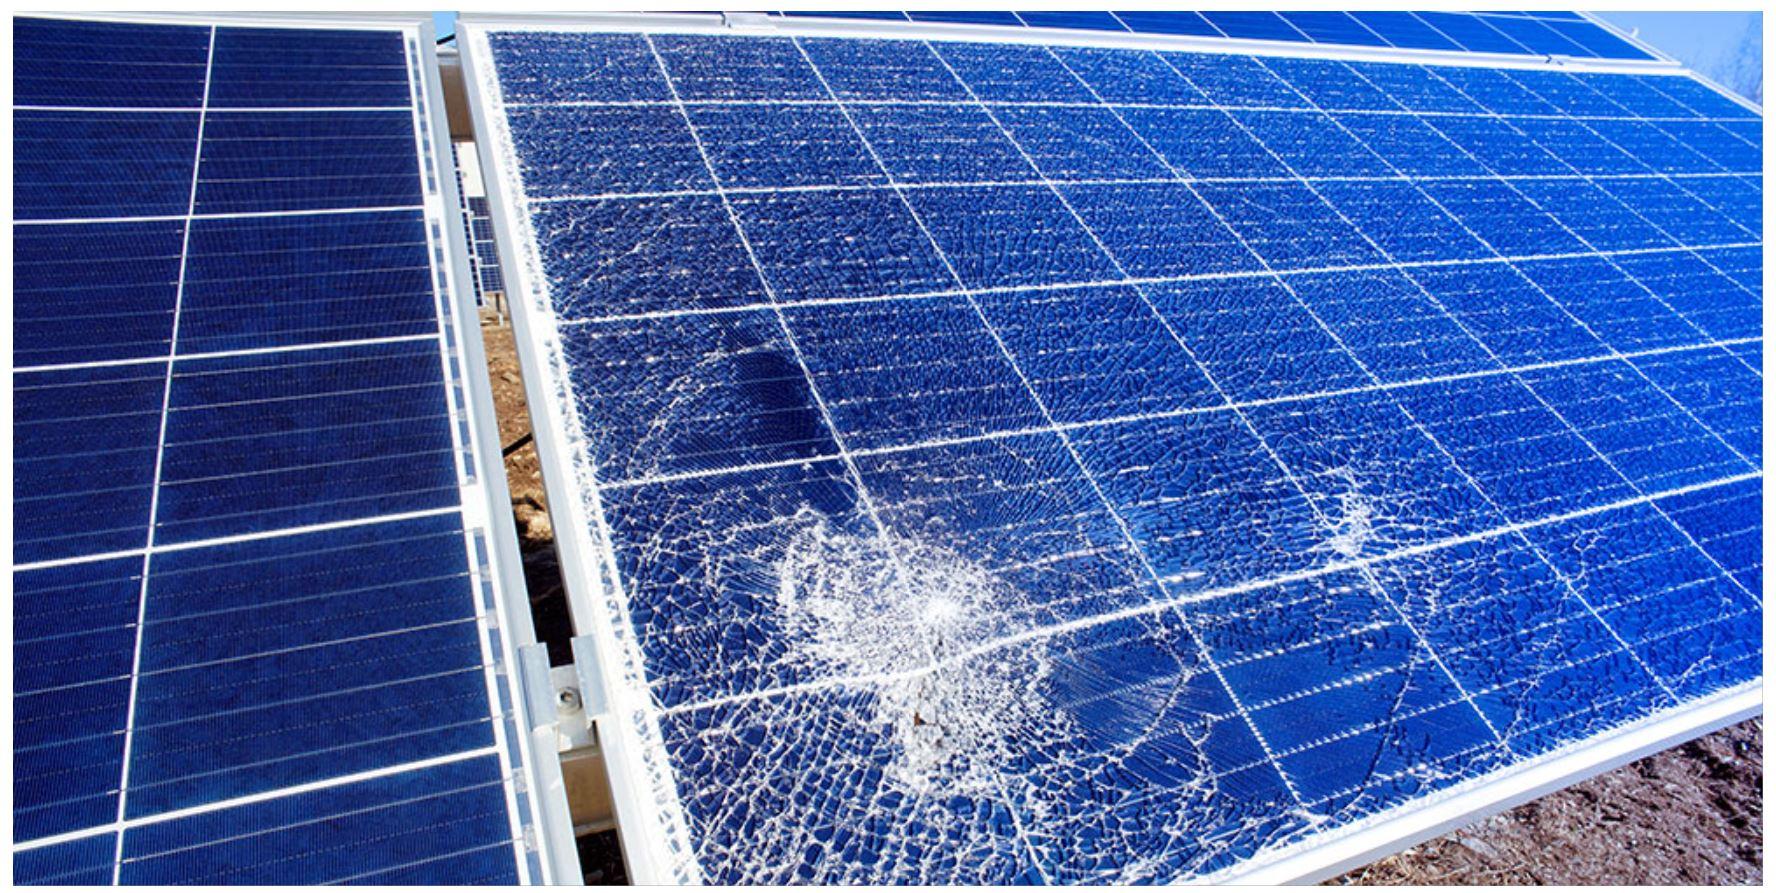 a damaged solar panel